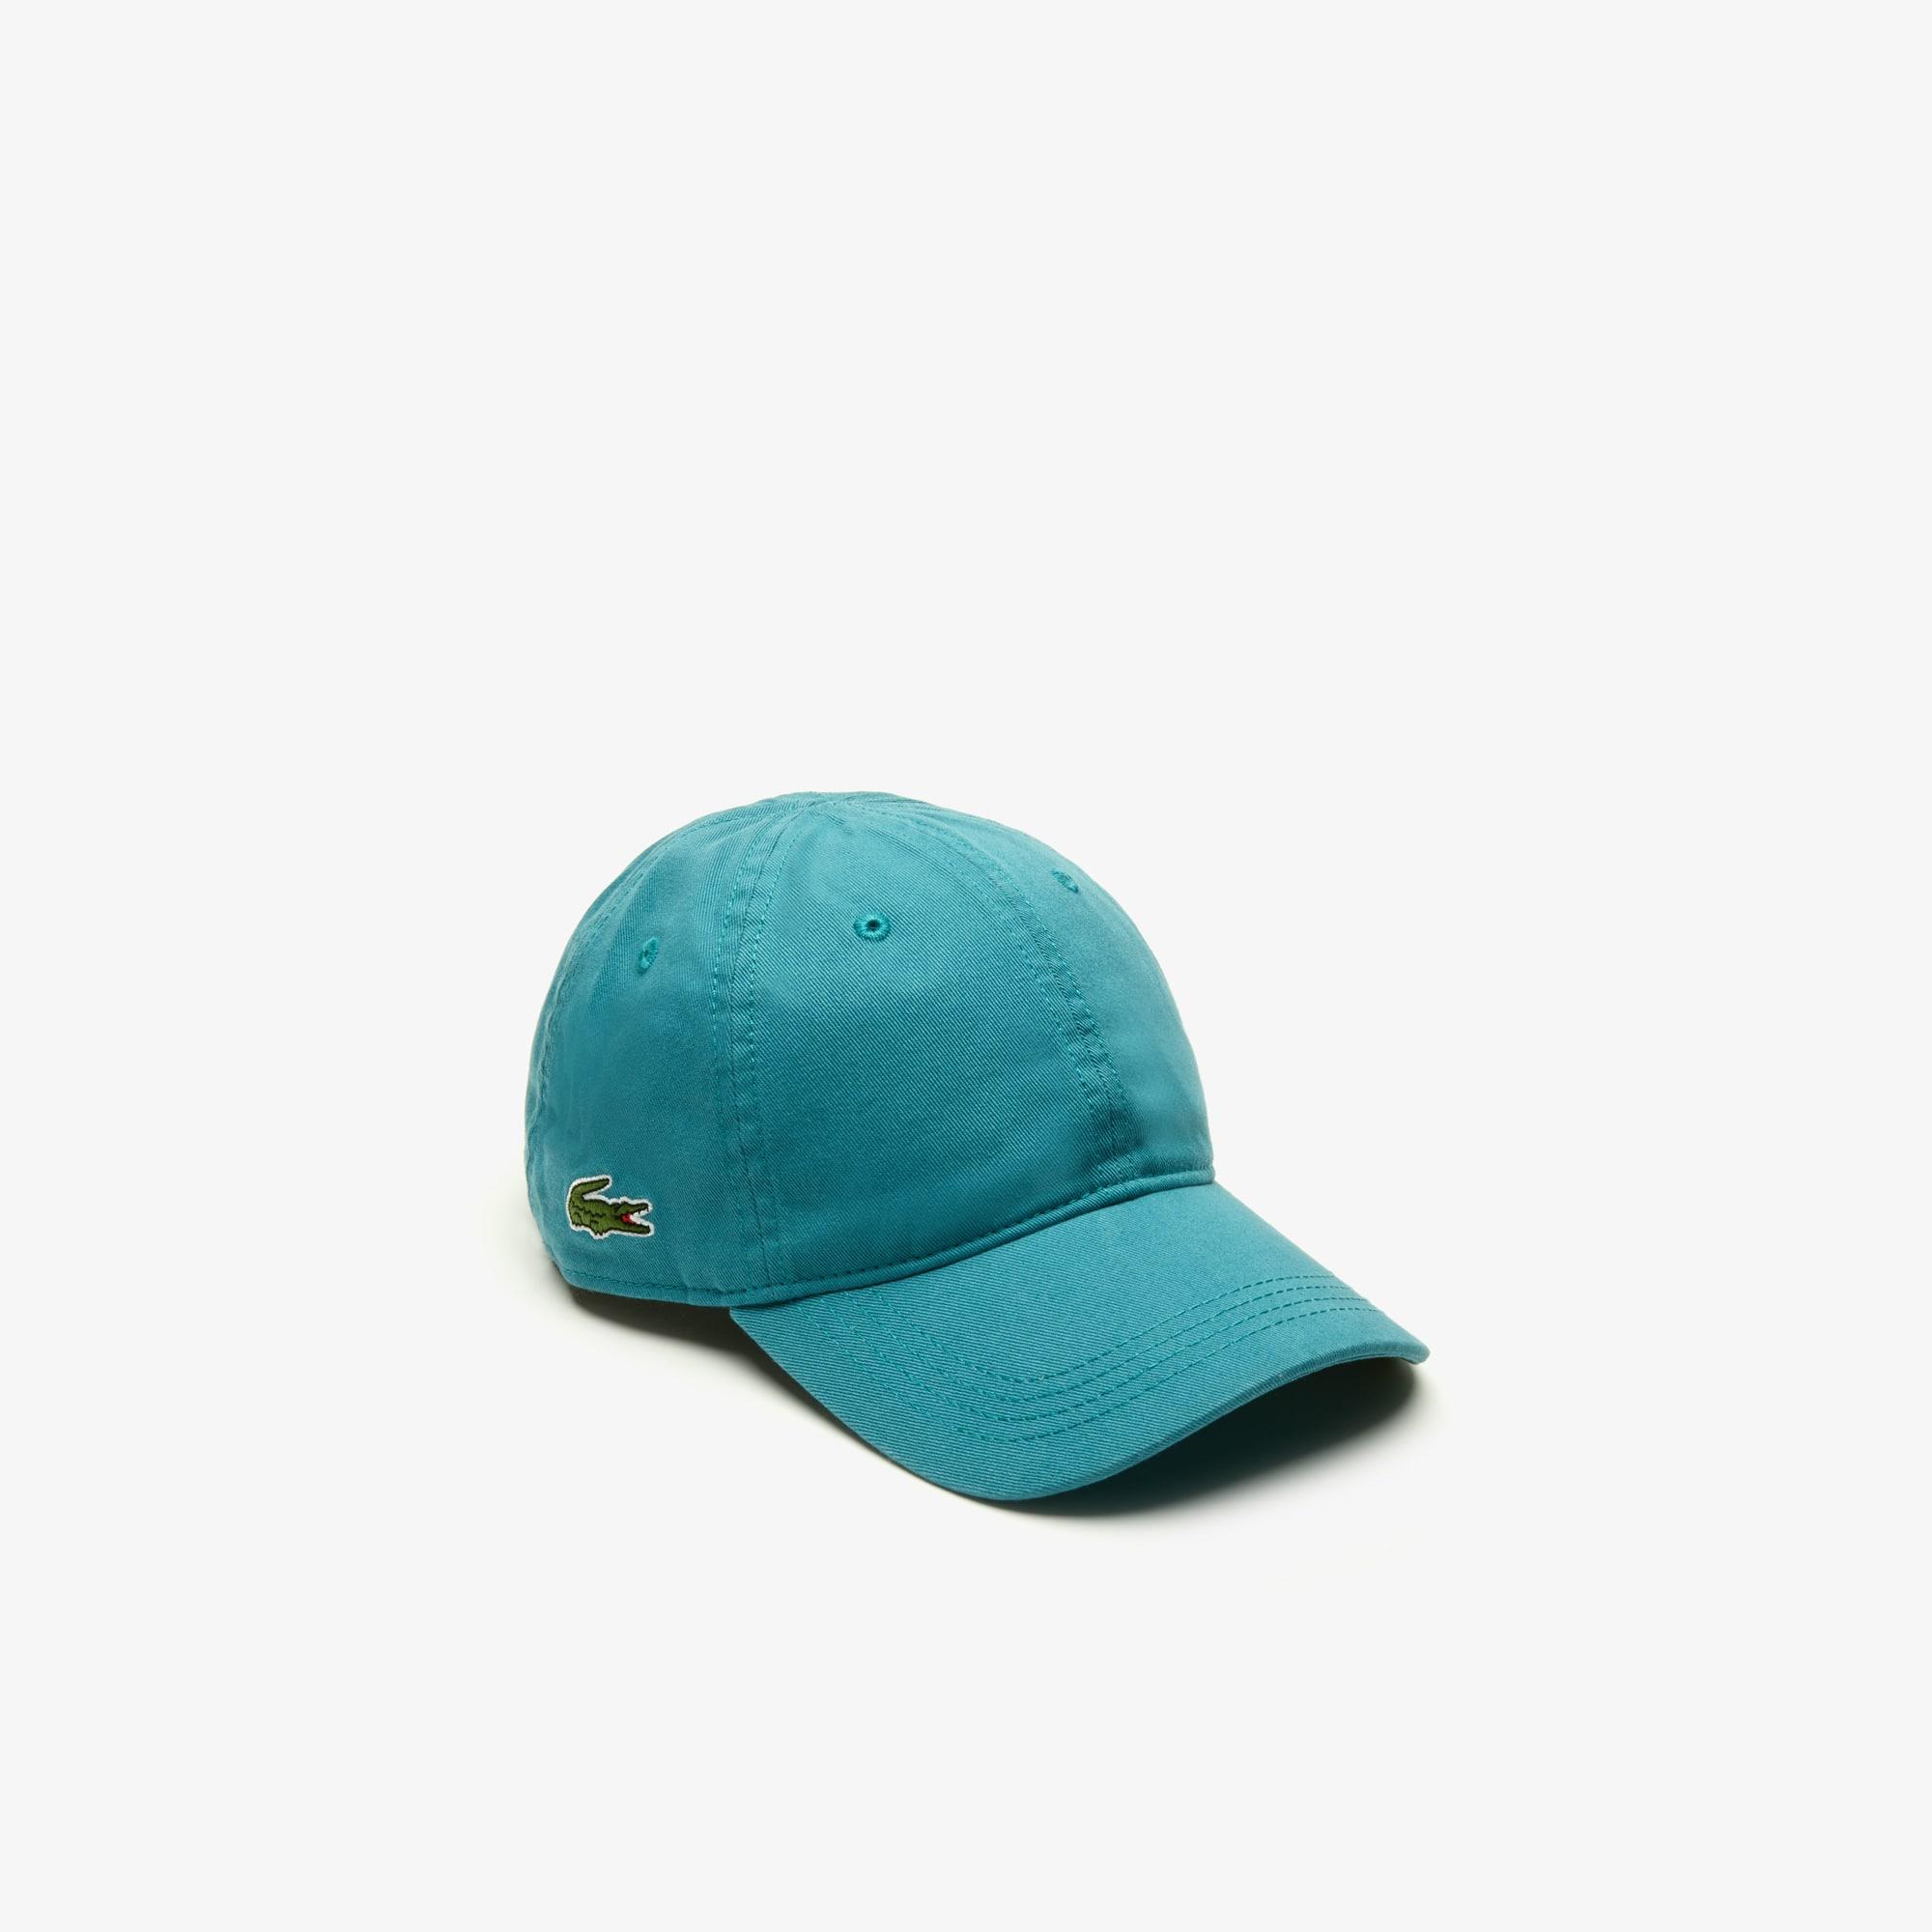 99ba7ff1aa5 Caps   Hats